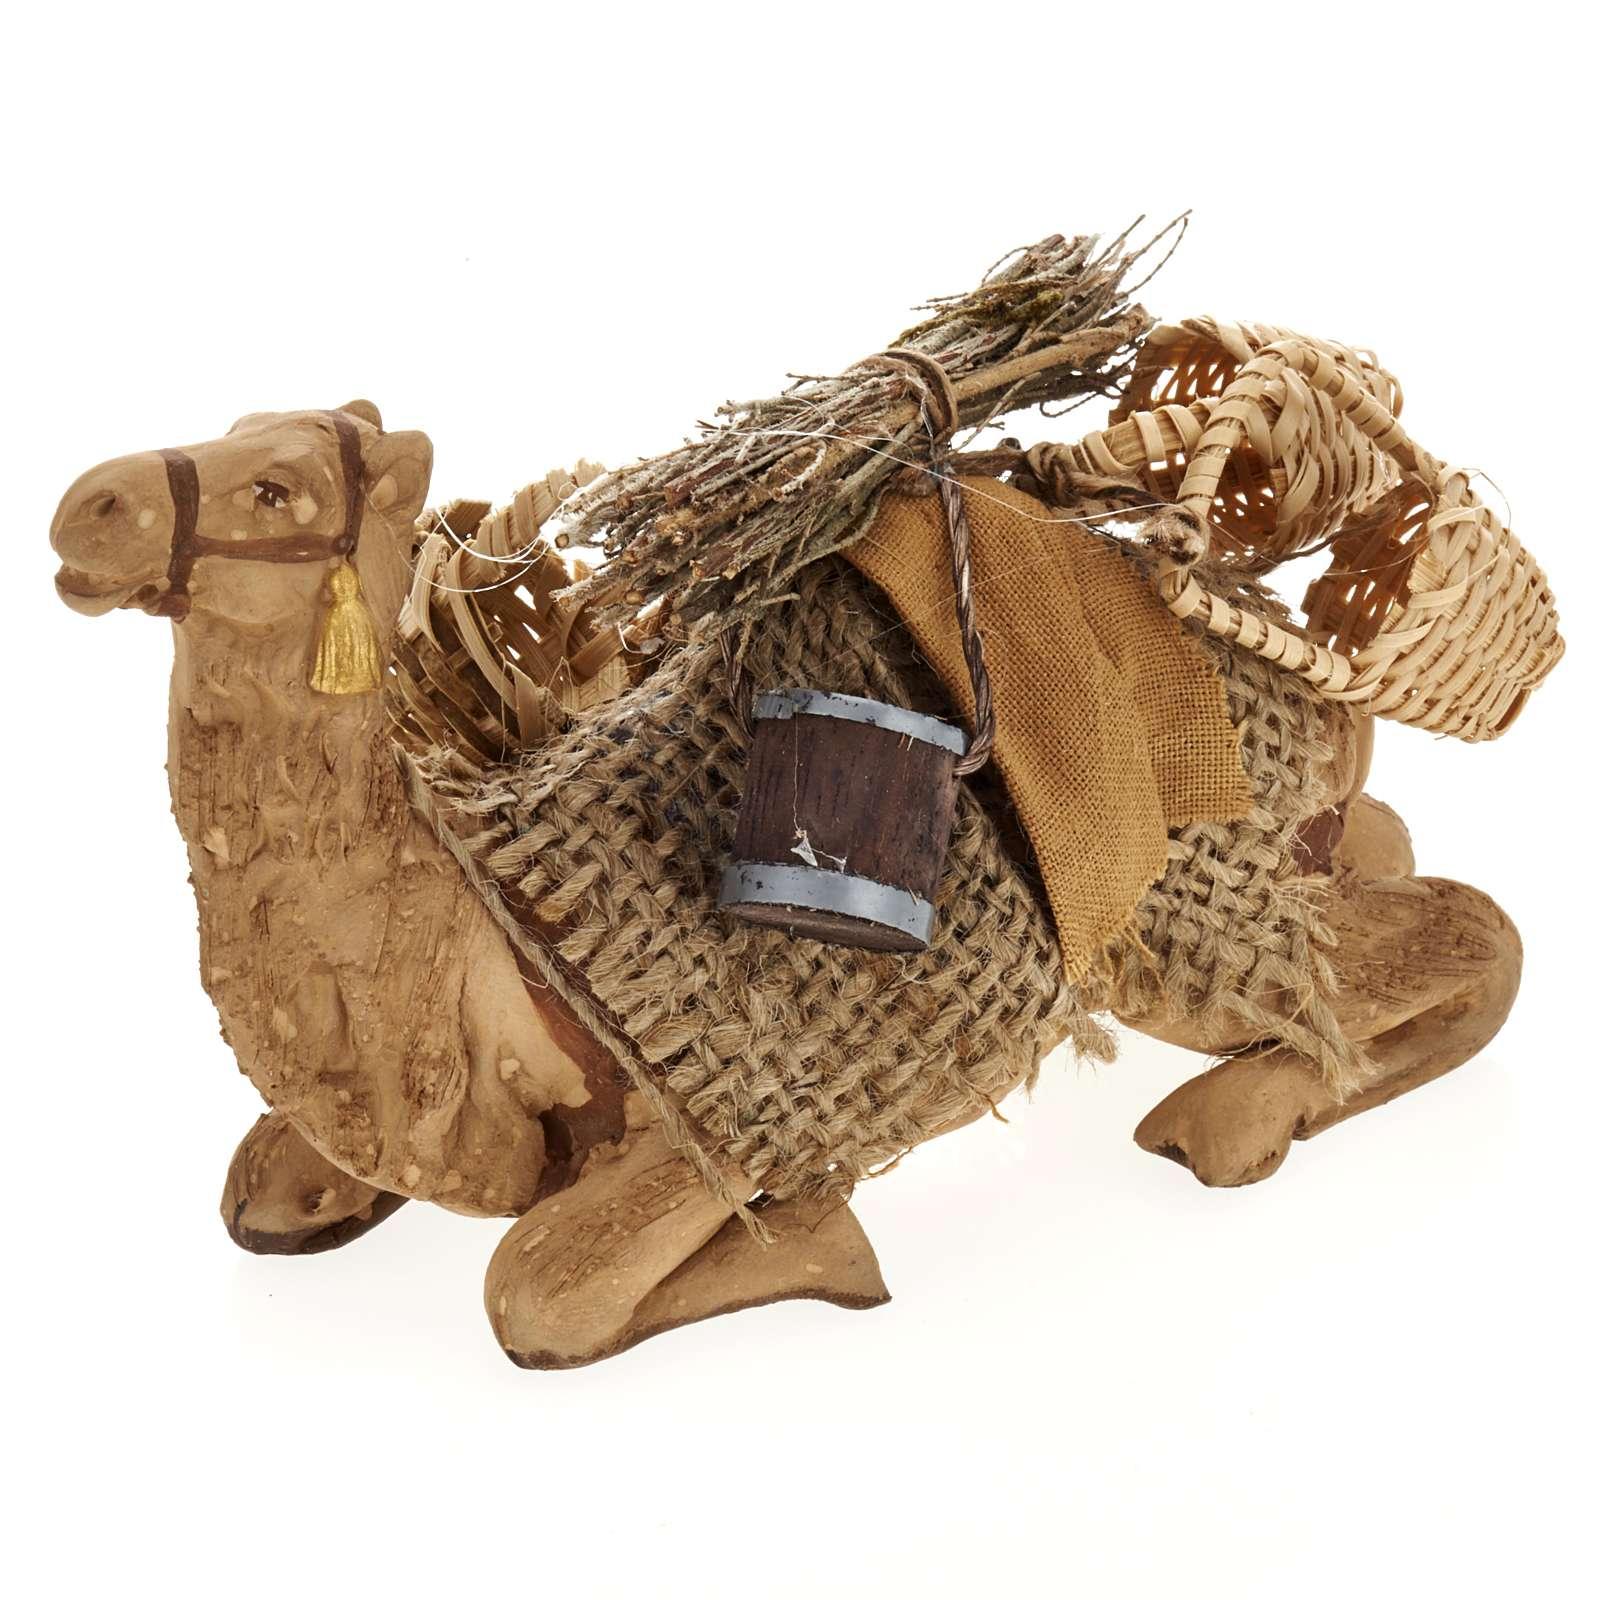 Nativity set accessory geared camel resting 10cm figurine 4